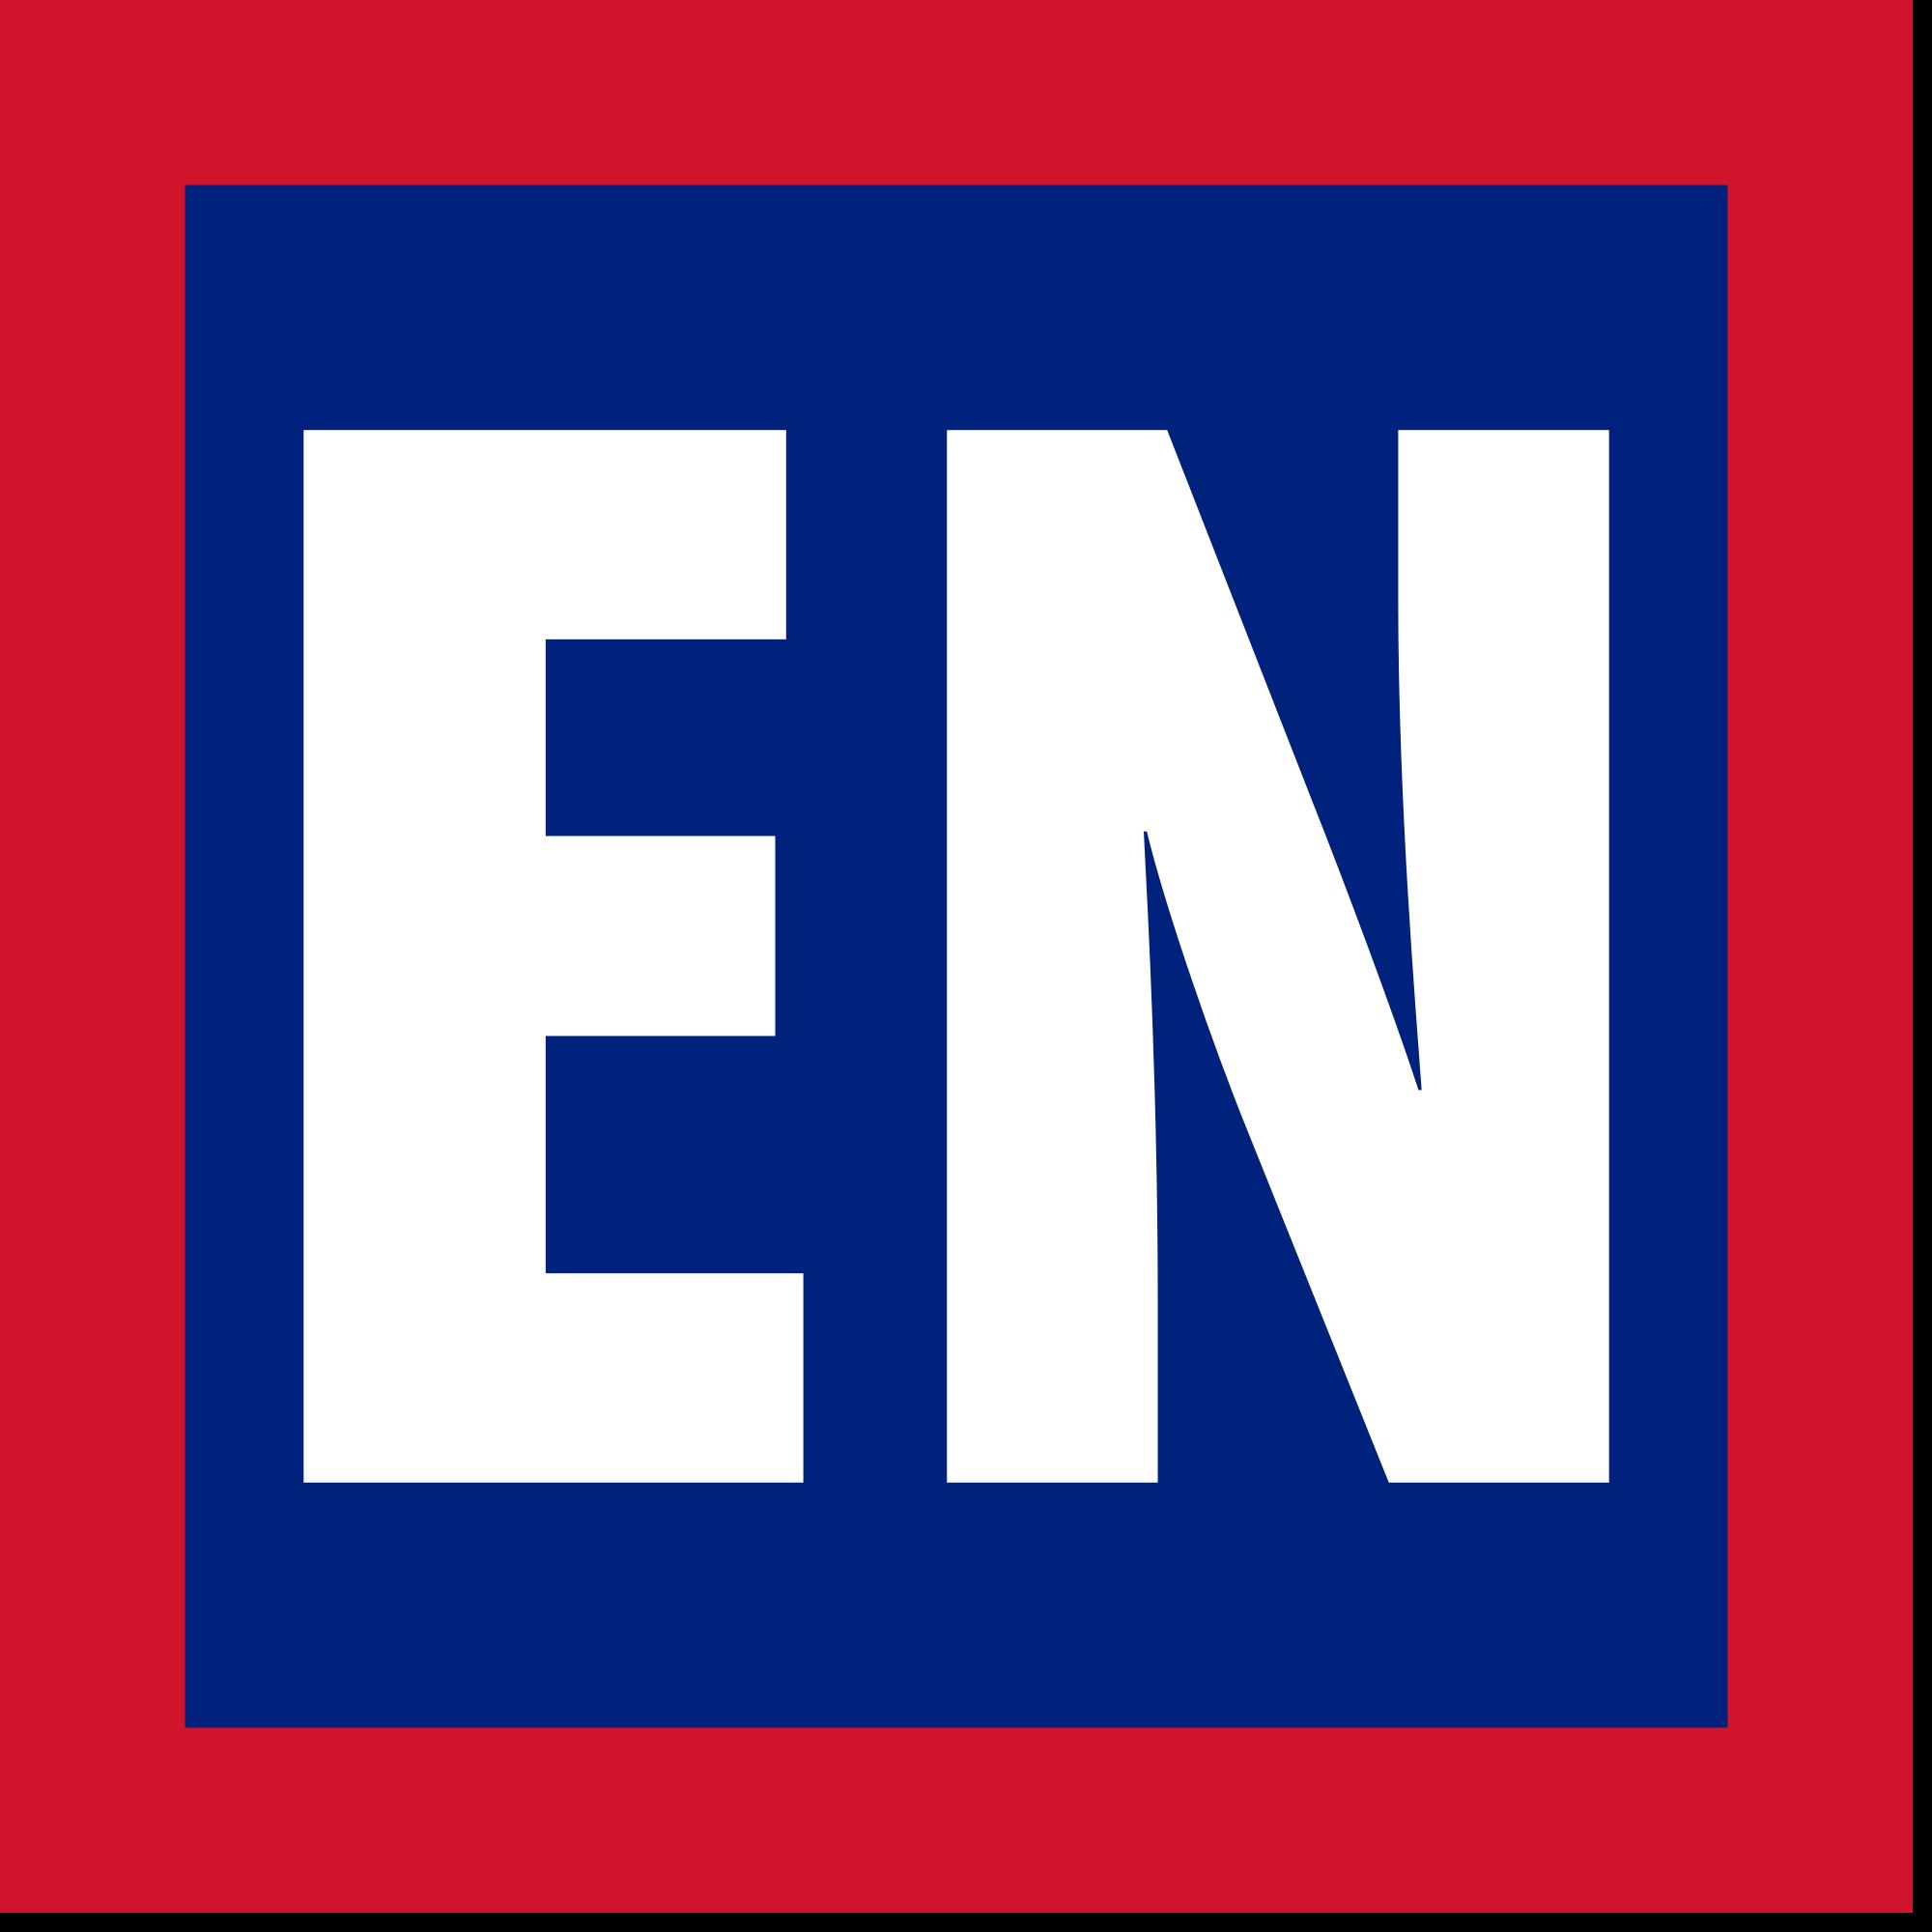 EN_English_Language_Symbol_ISO_639-1_IETF_Language_Tag_Icon.svg